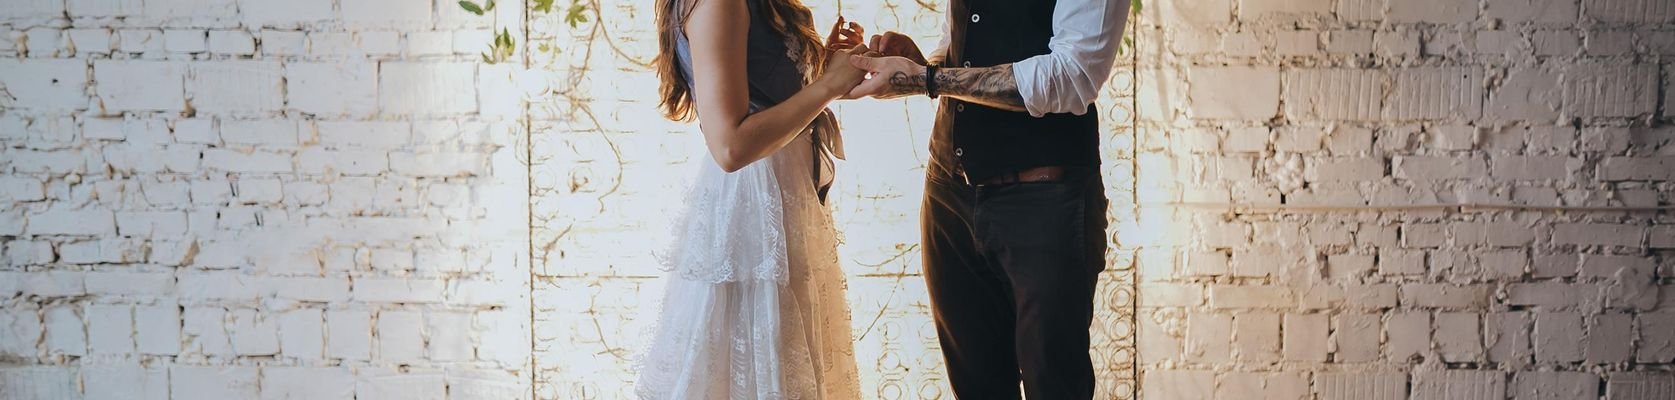 Styled Shoots, Styleshooting, Hochzeitsshooting, Weddingstyle